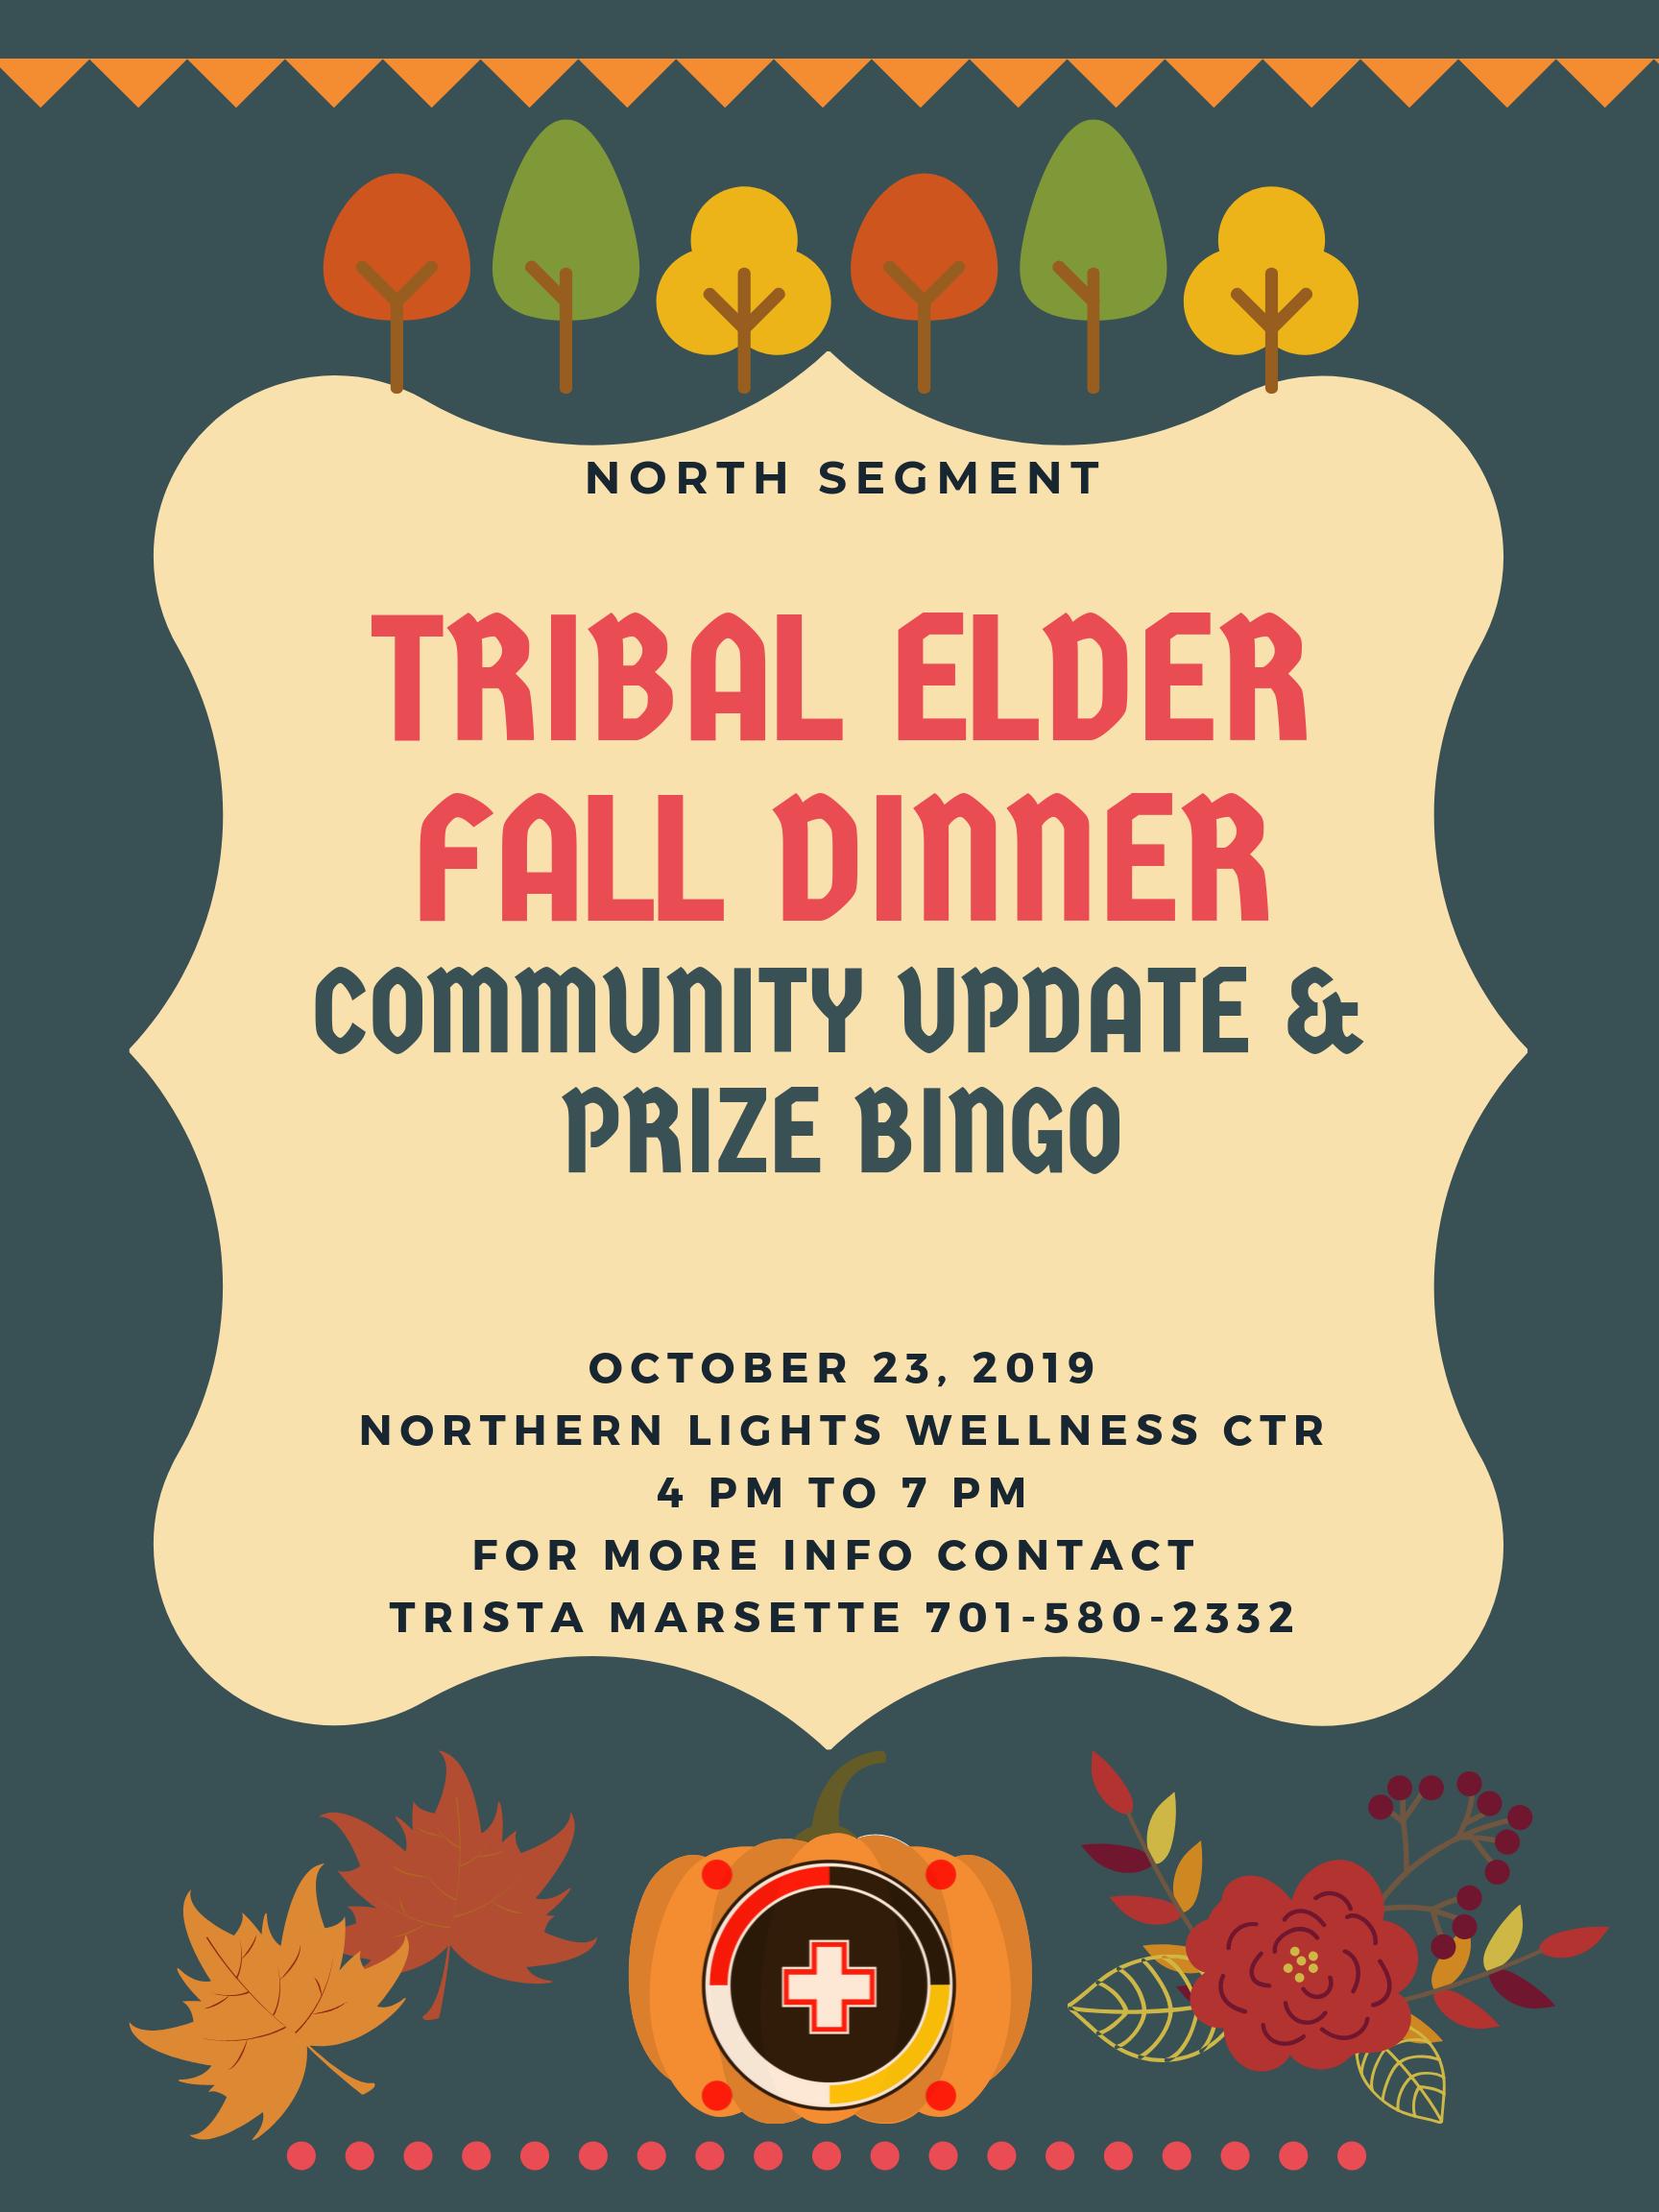 North Segment Tribal Elder Fall Dinner.png